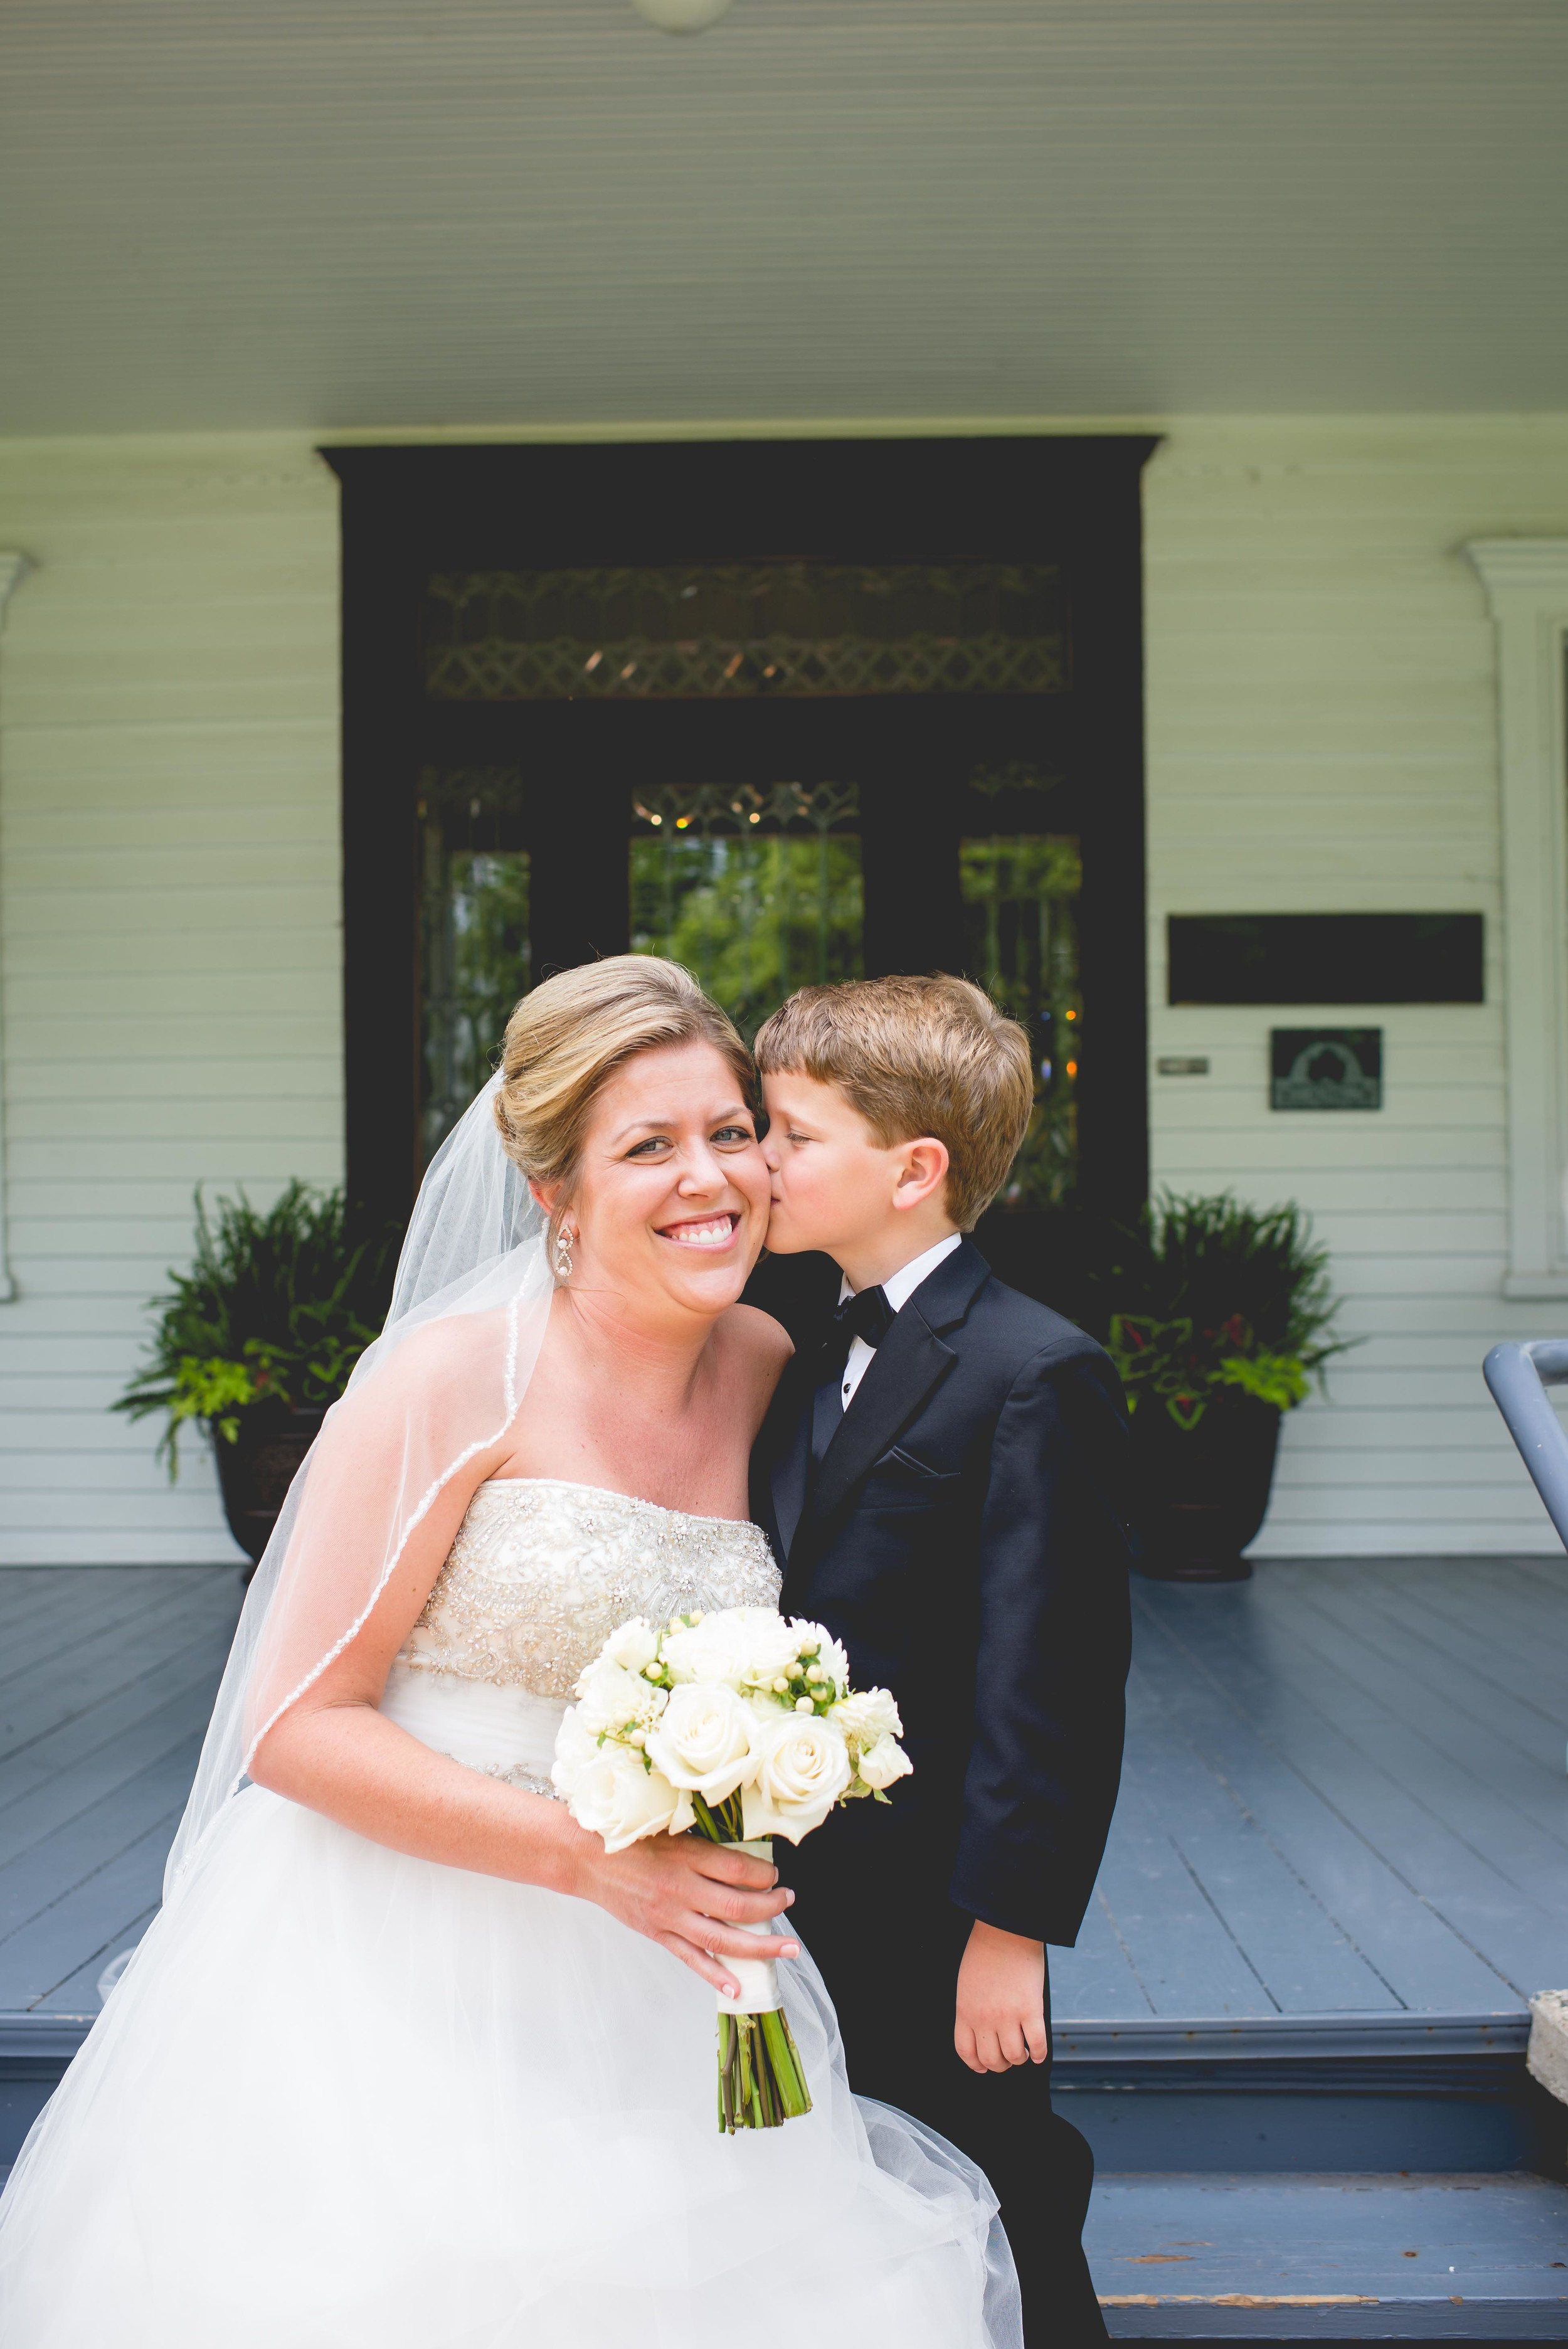 sarasutterphotography_leeandshalon_wedding_2015-151.jpg